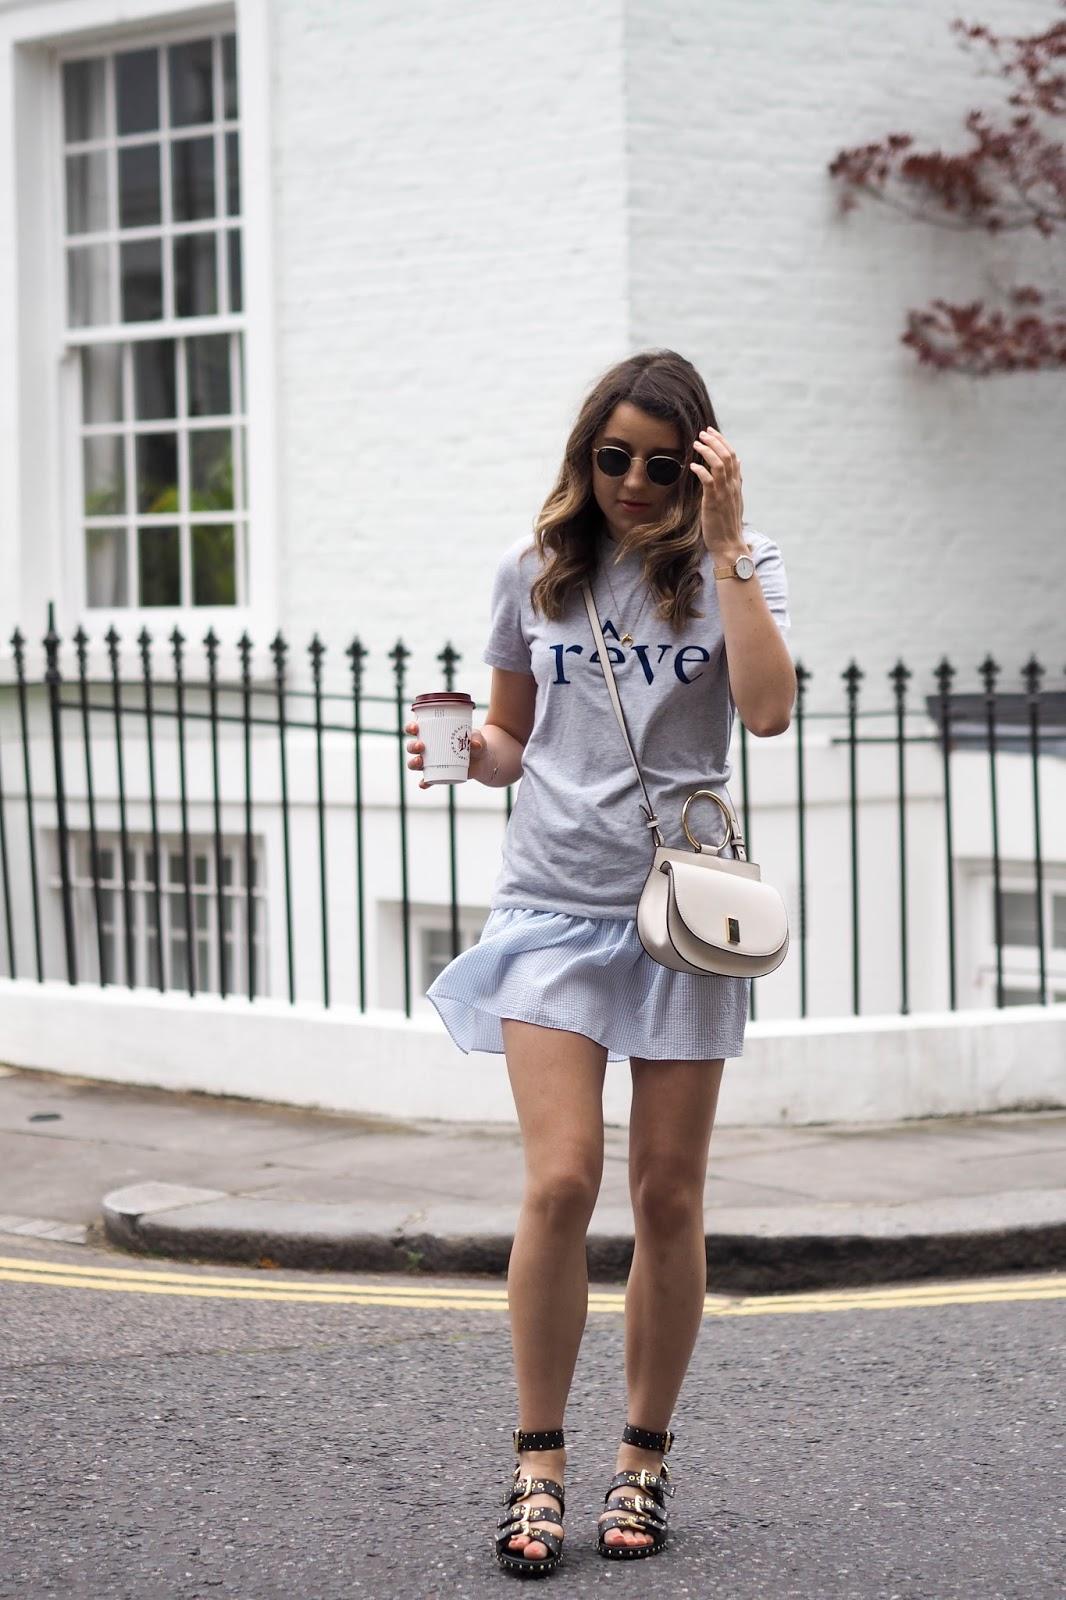 92bc38933a7 Summer Stripes & Slogan Tees | What's In Her Wardrobe | Bloglovin'